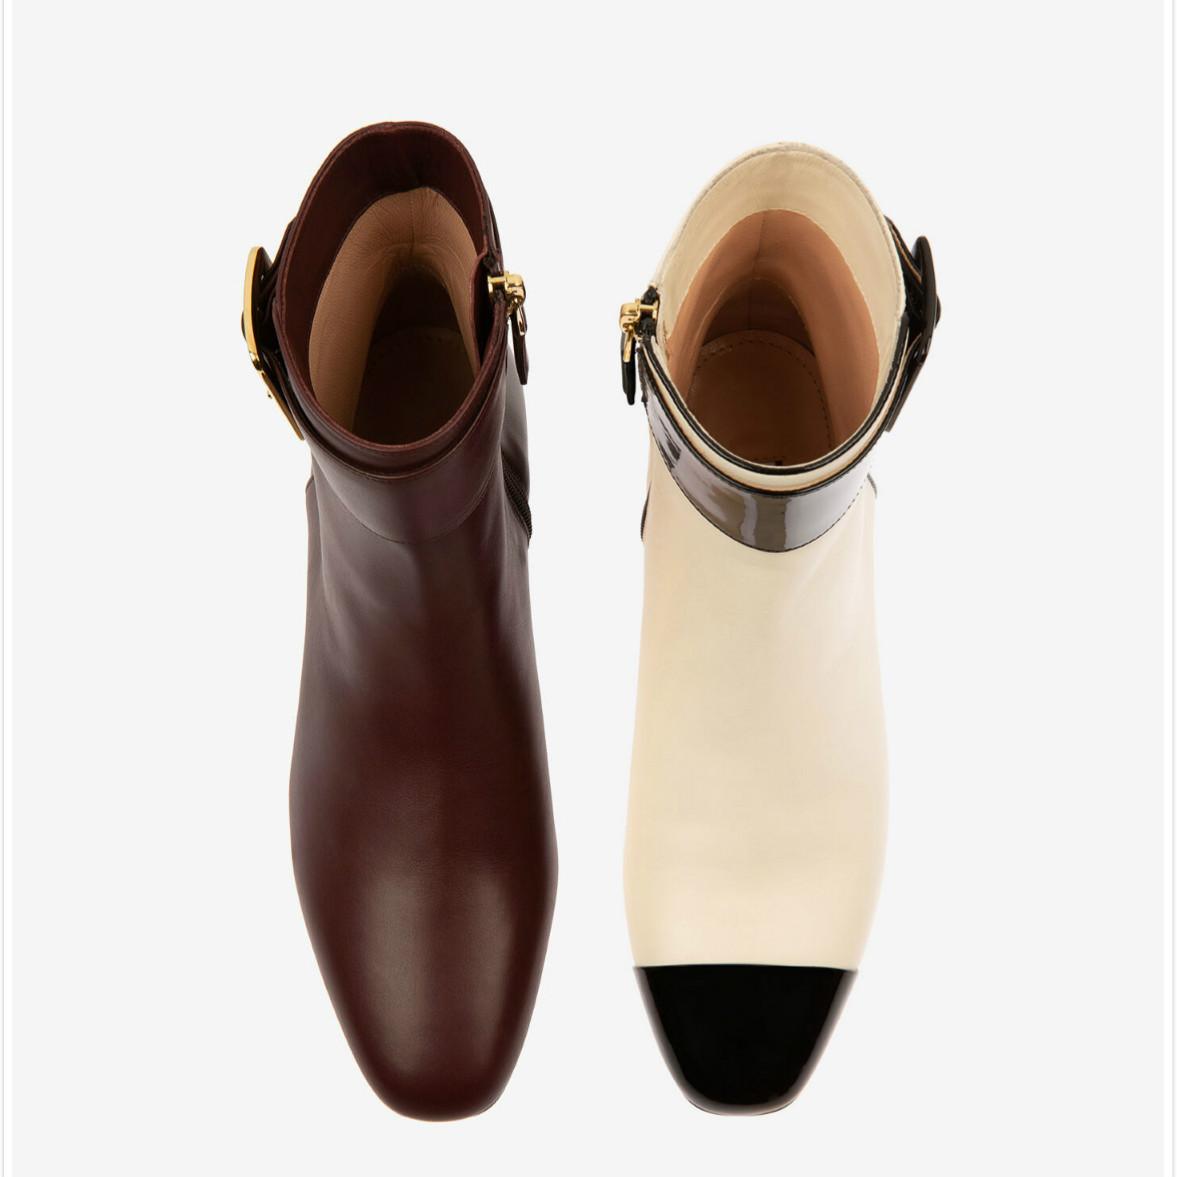 JANELLE风格的靴子!Bally Jay粗跟靴